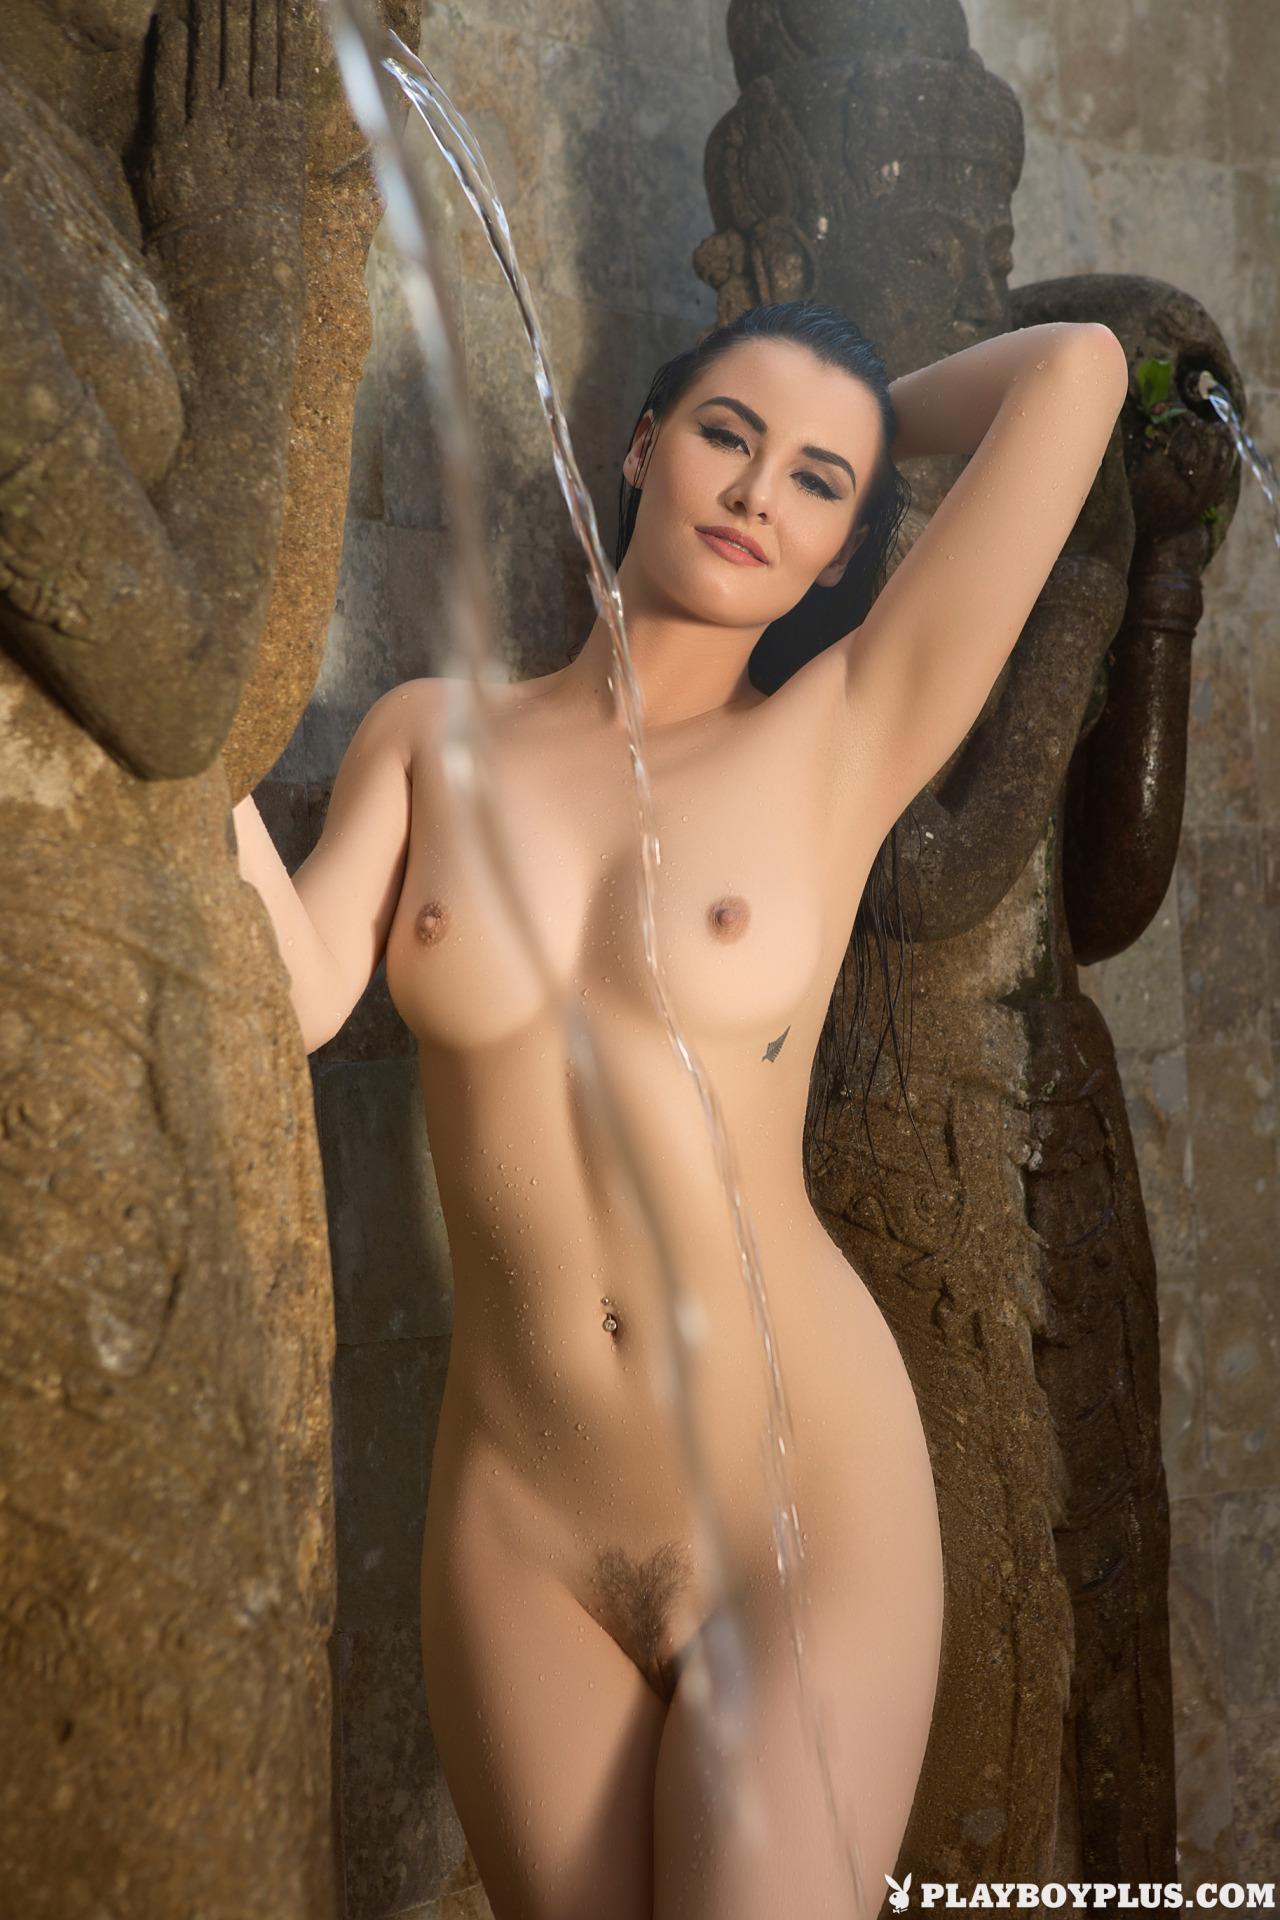 Skylar Leigh Playboyplus - Series 6 - Vanilla Babes